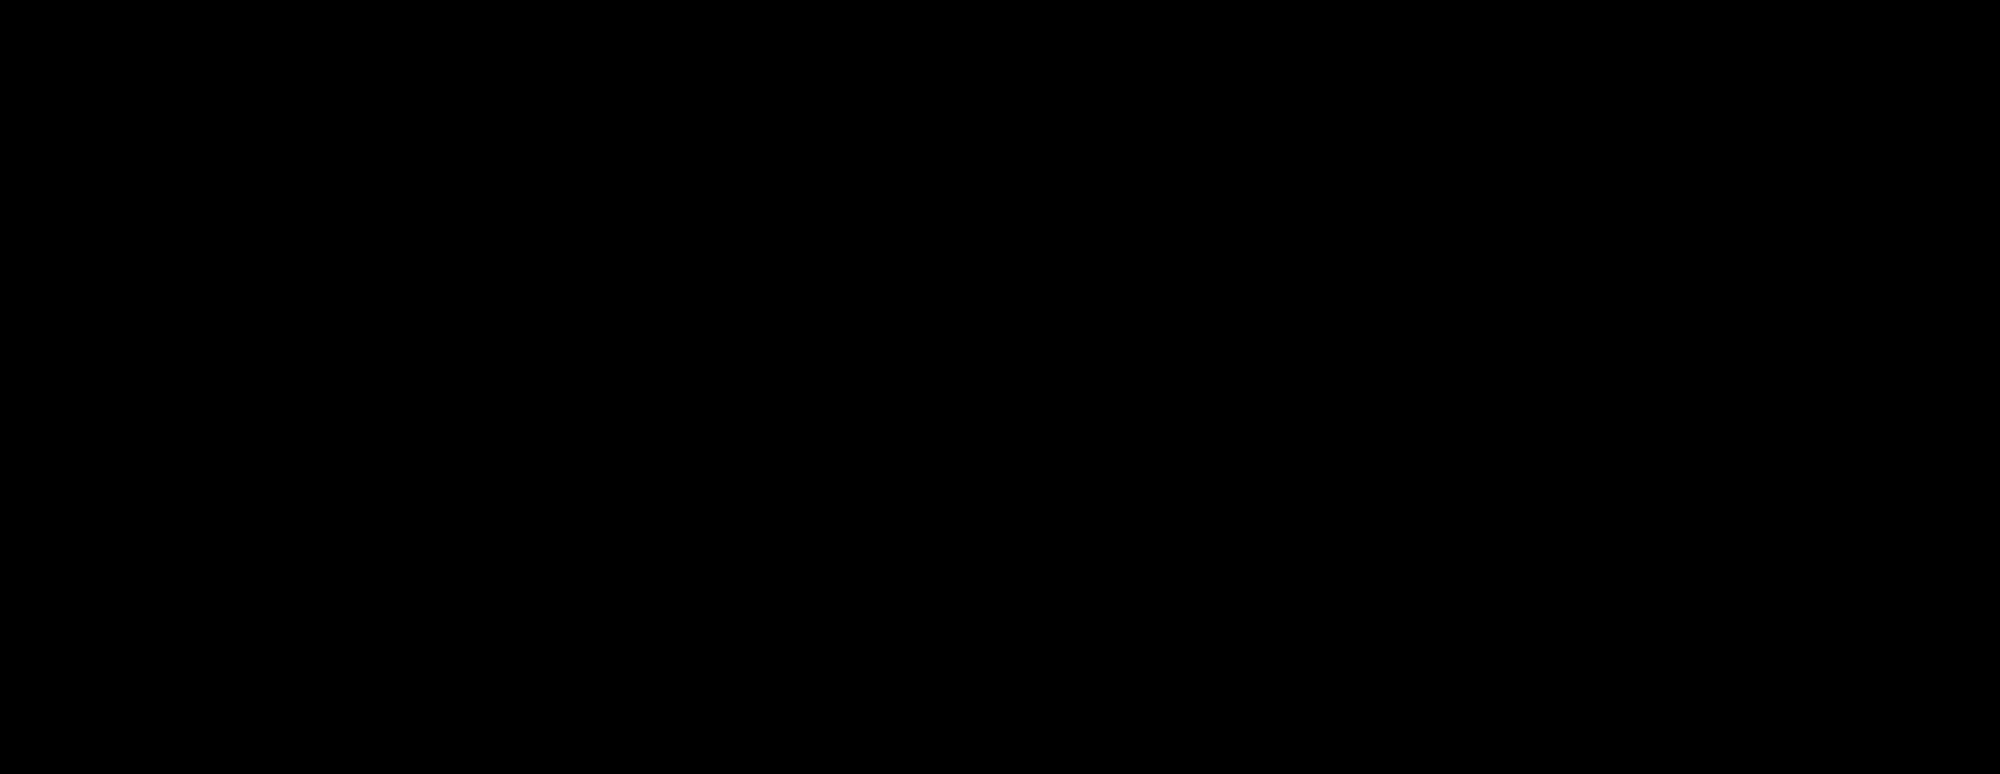 tfc_logo_tfcorg_darkbg.png